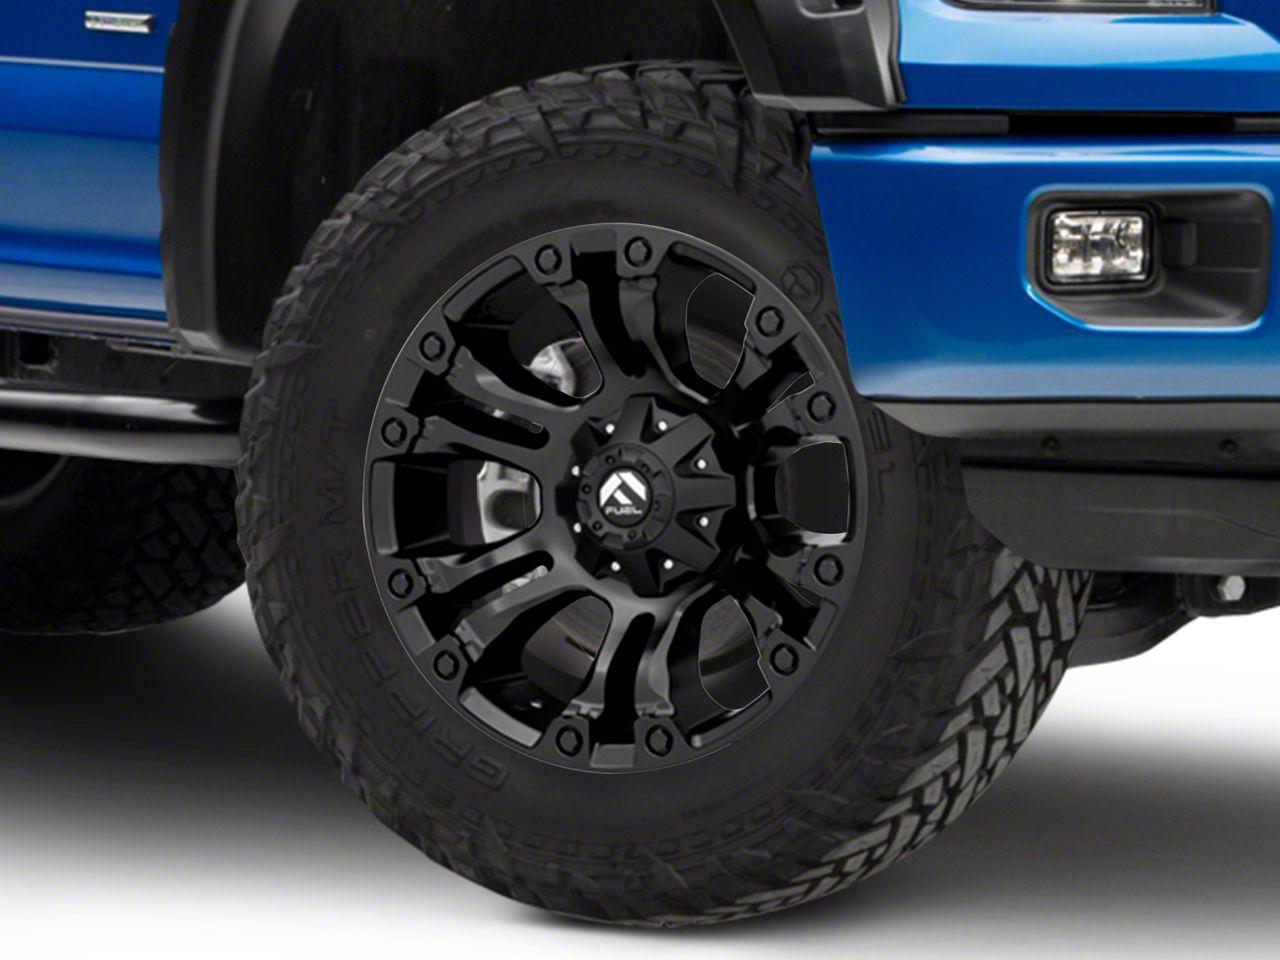 Fuel Wheels Vapor Black 6-Lug Wheel - 20x9 +01mm Offset (04-19 F-150)